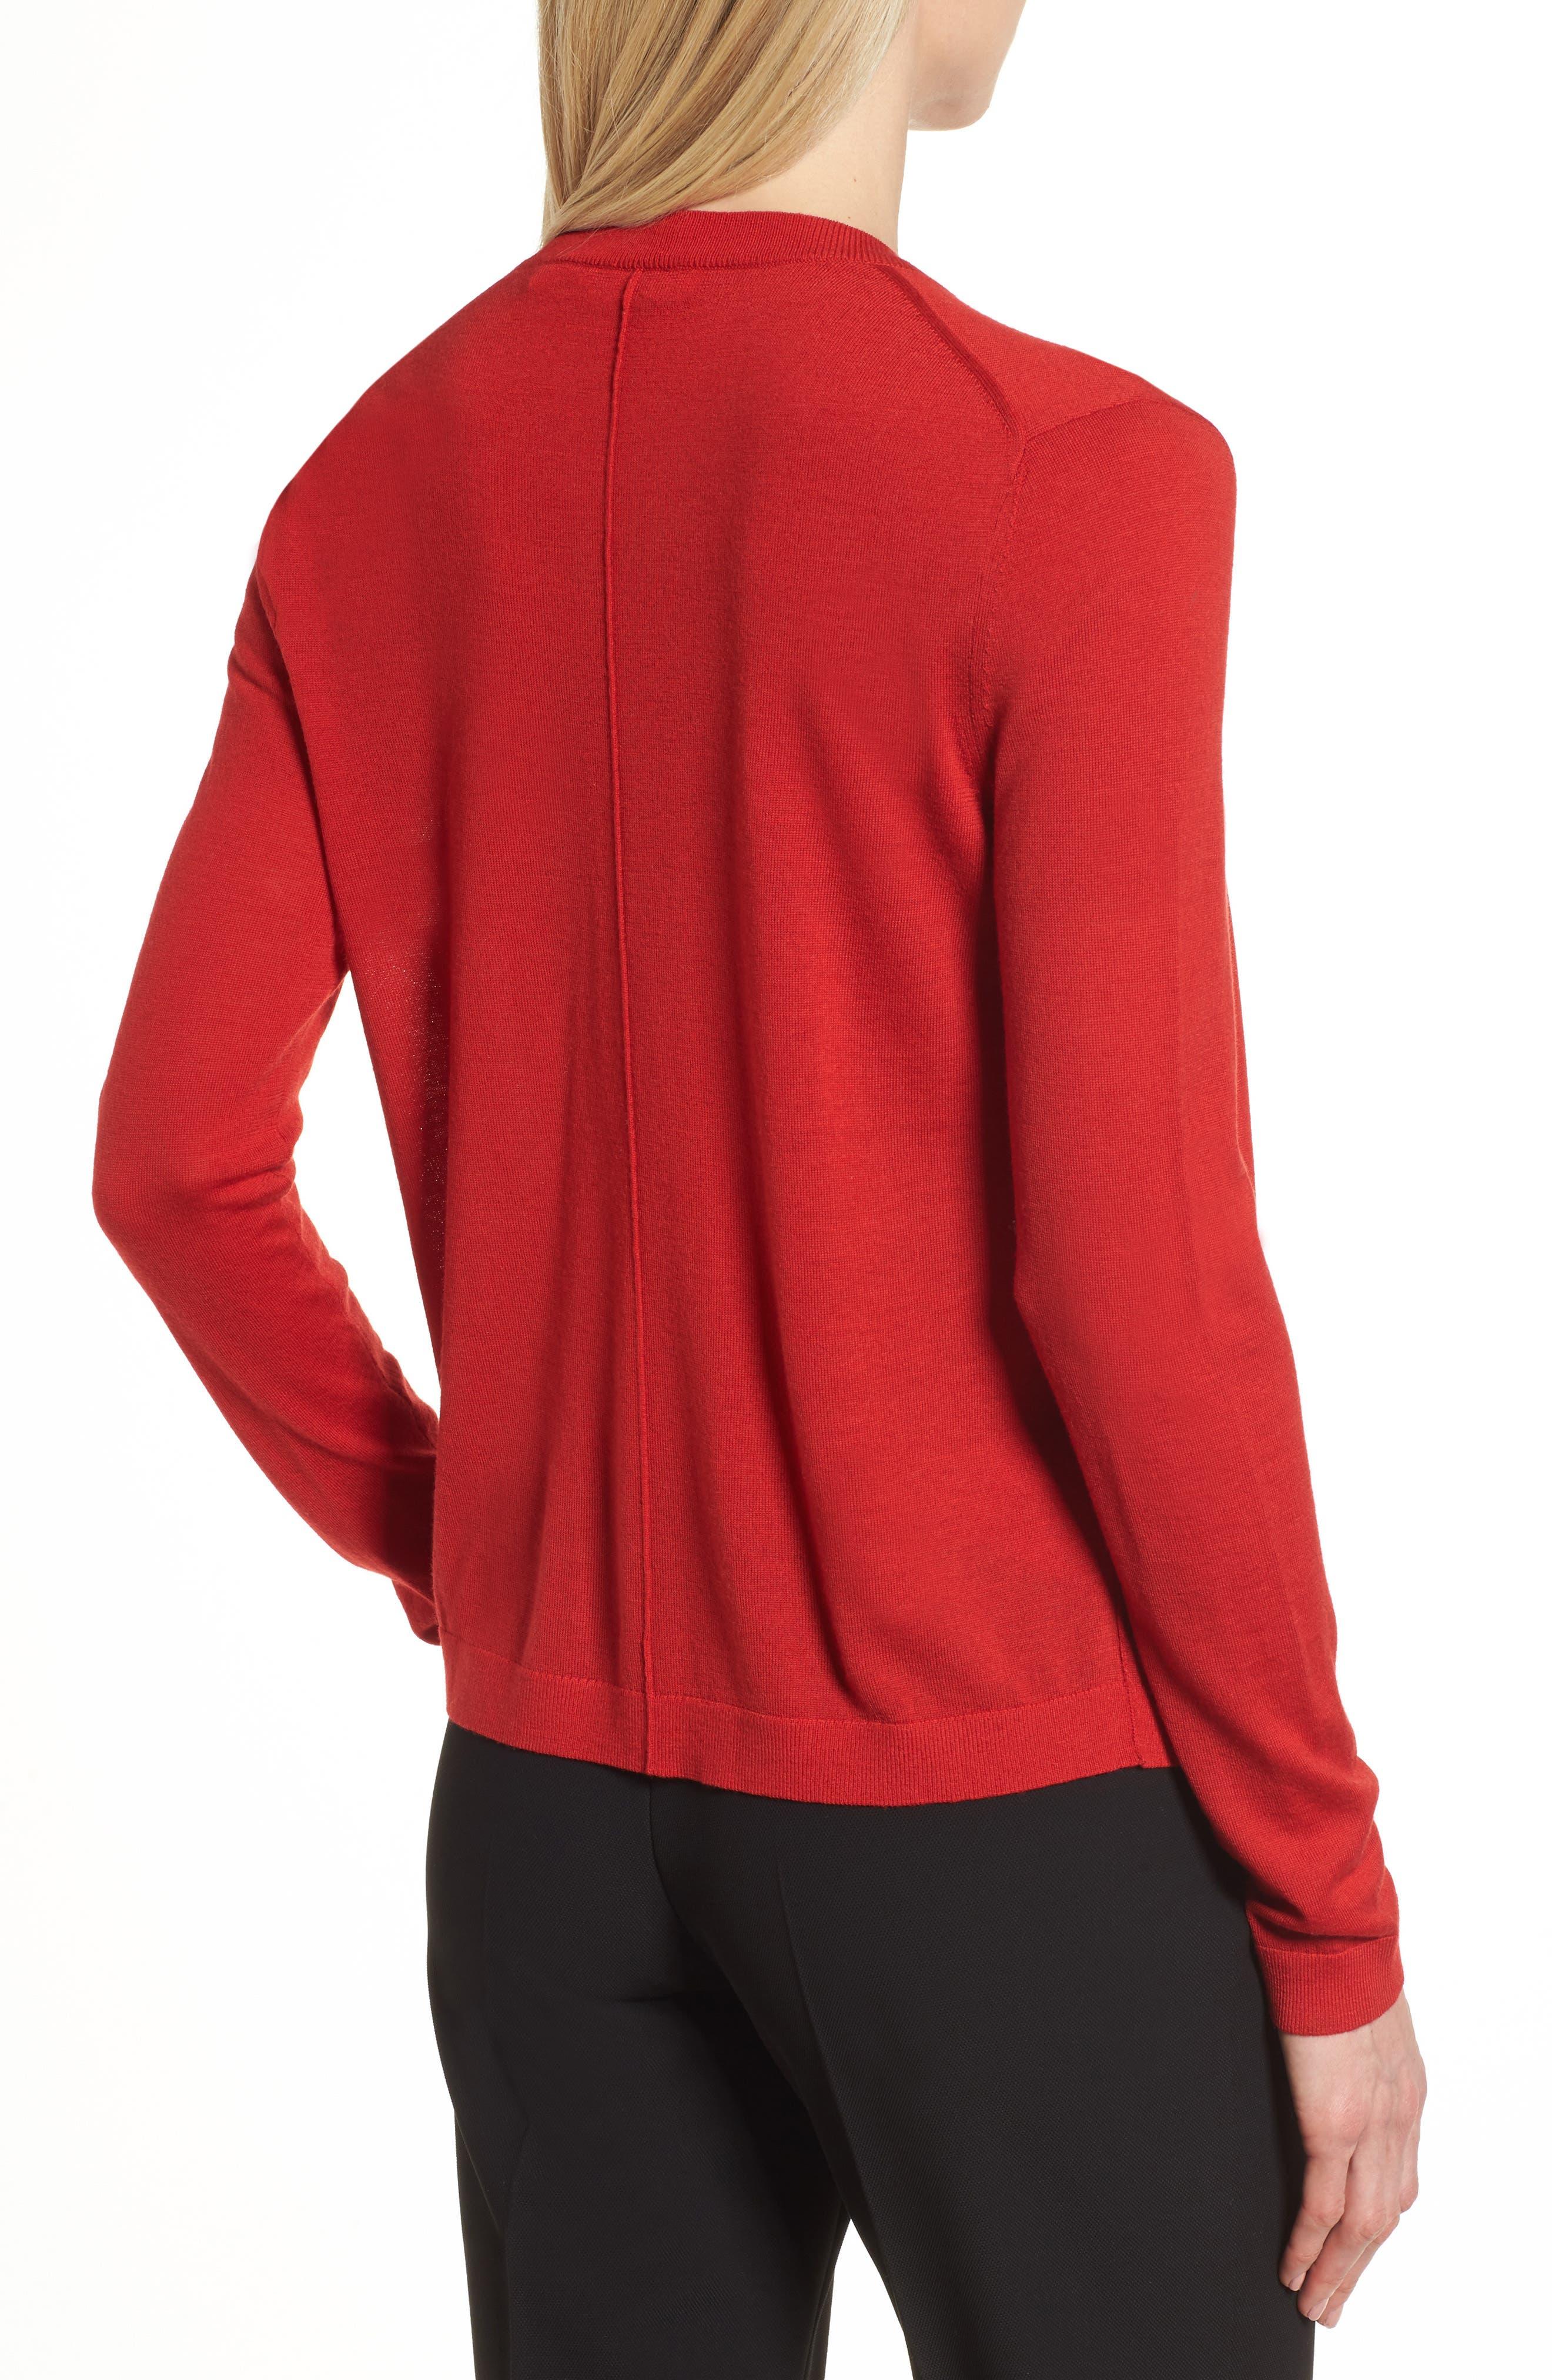 Fuyuma Wool Cardigan,                             Alternate thumbnail 2, color,                             Crimson Red